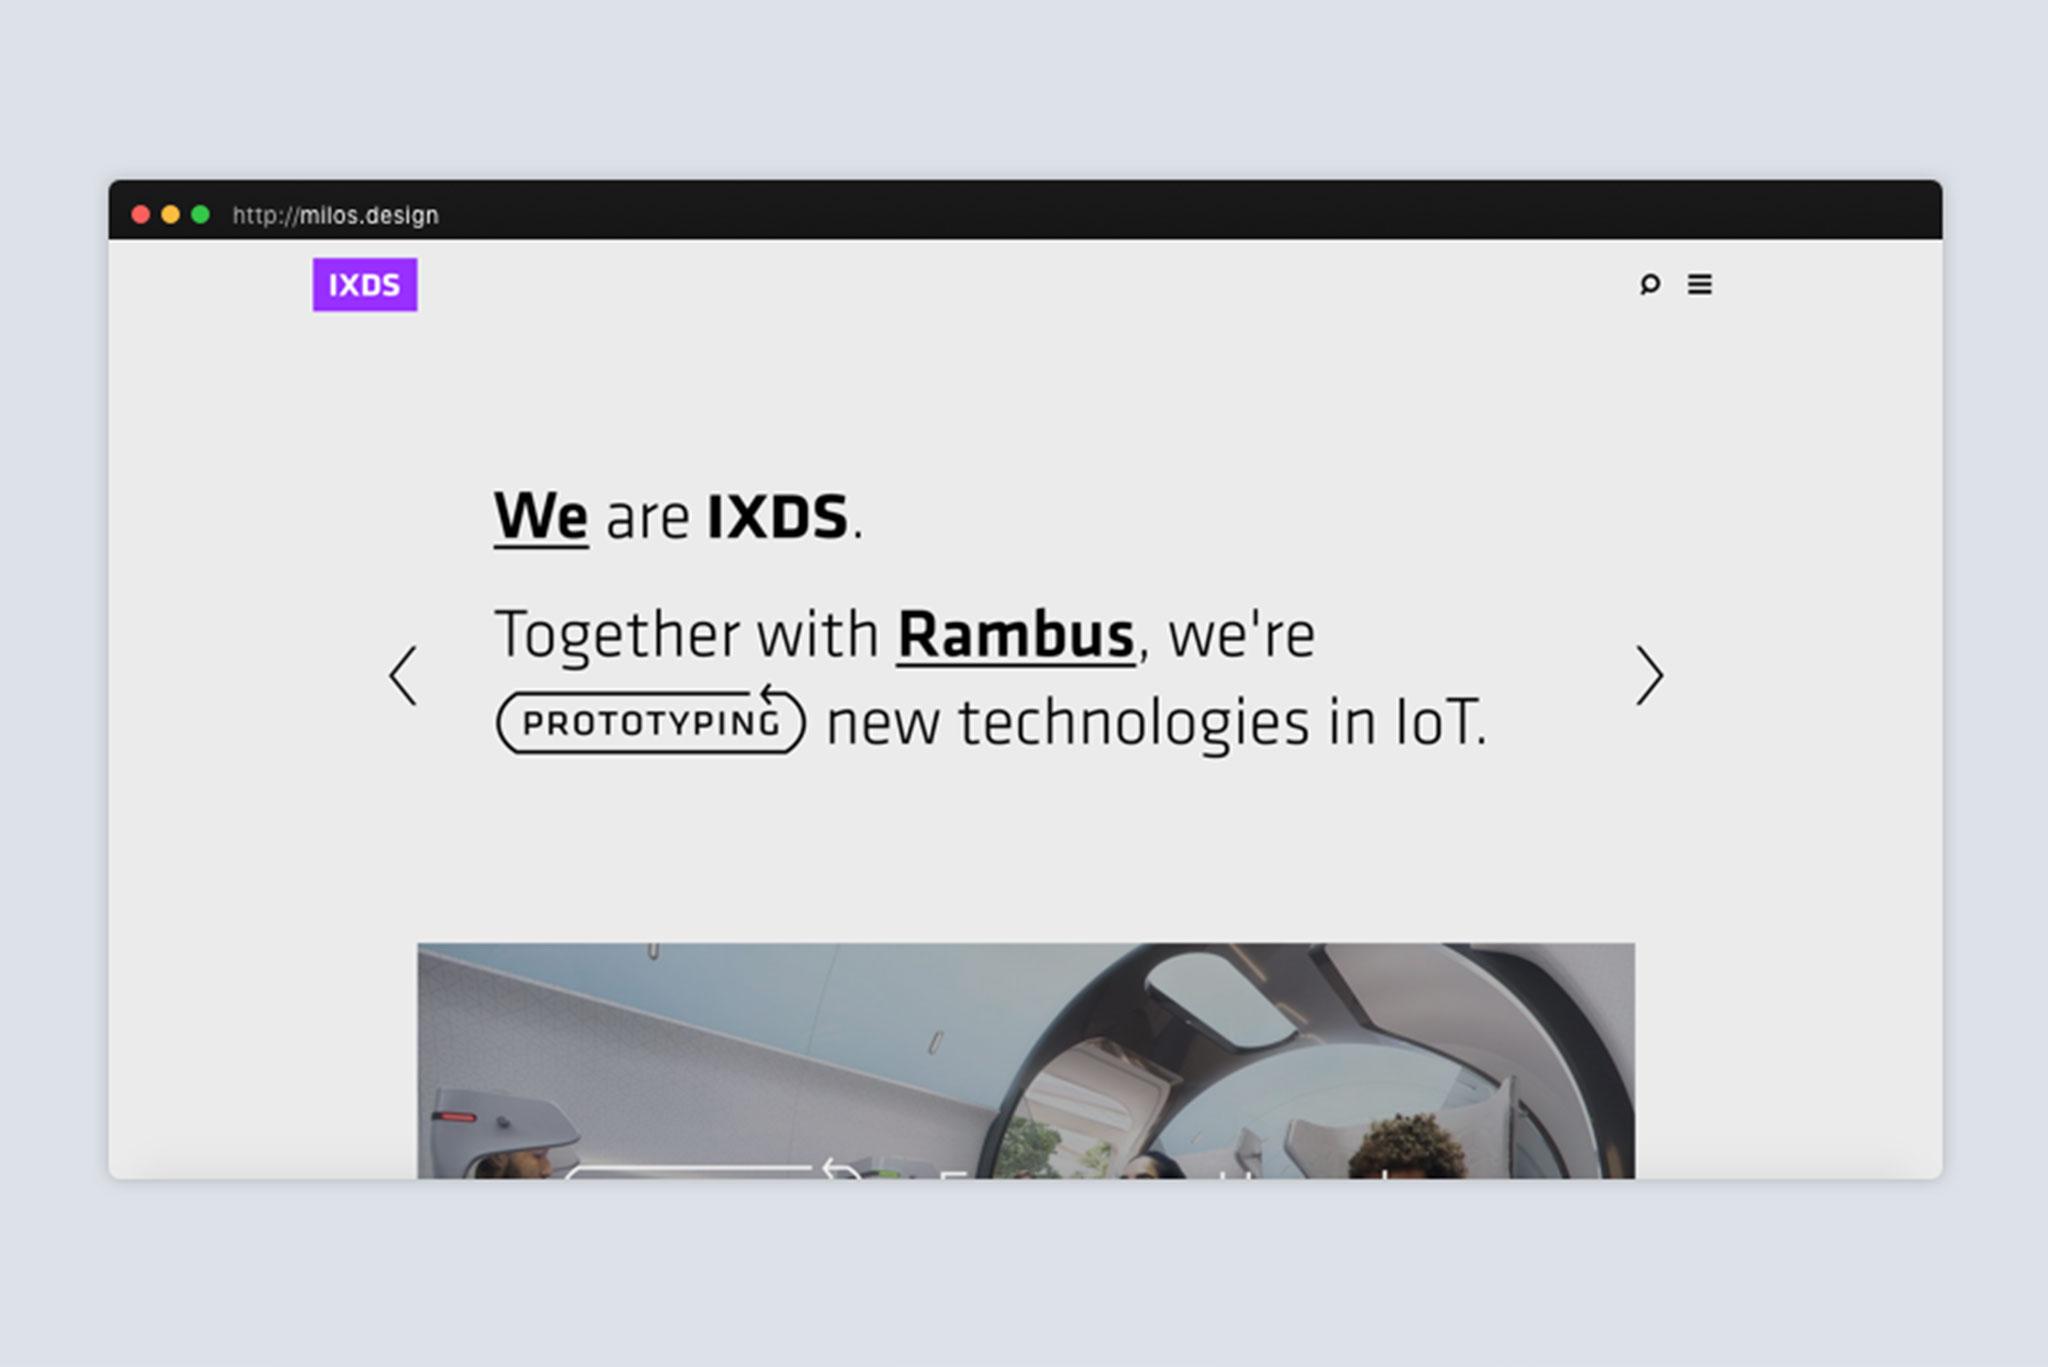 ixds-page-desktop